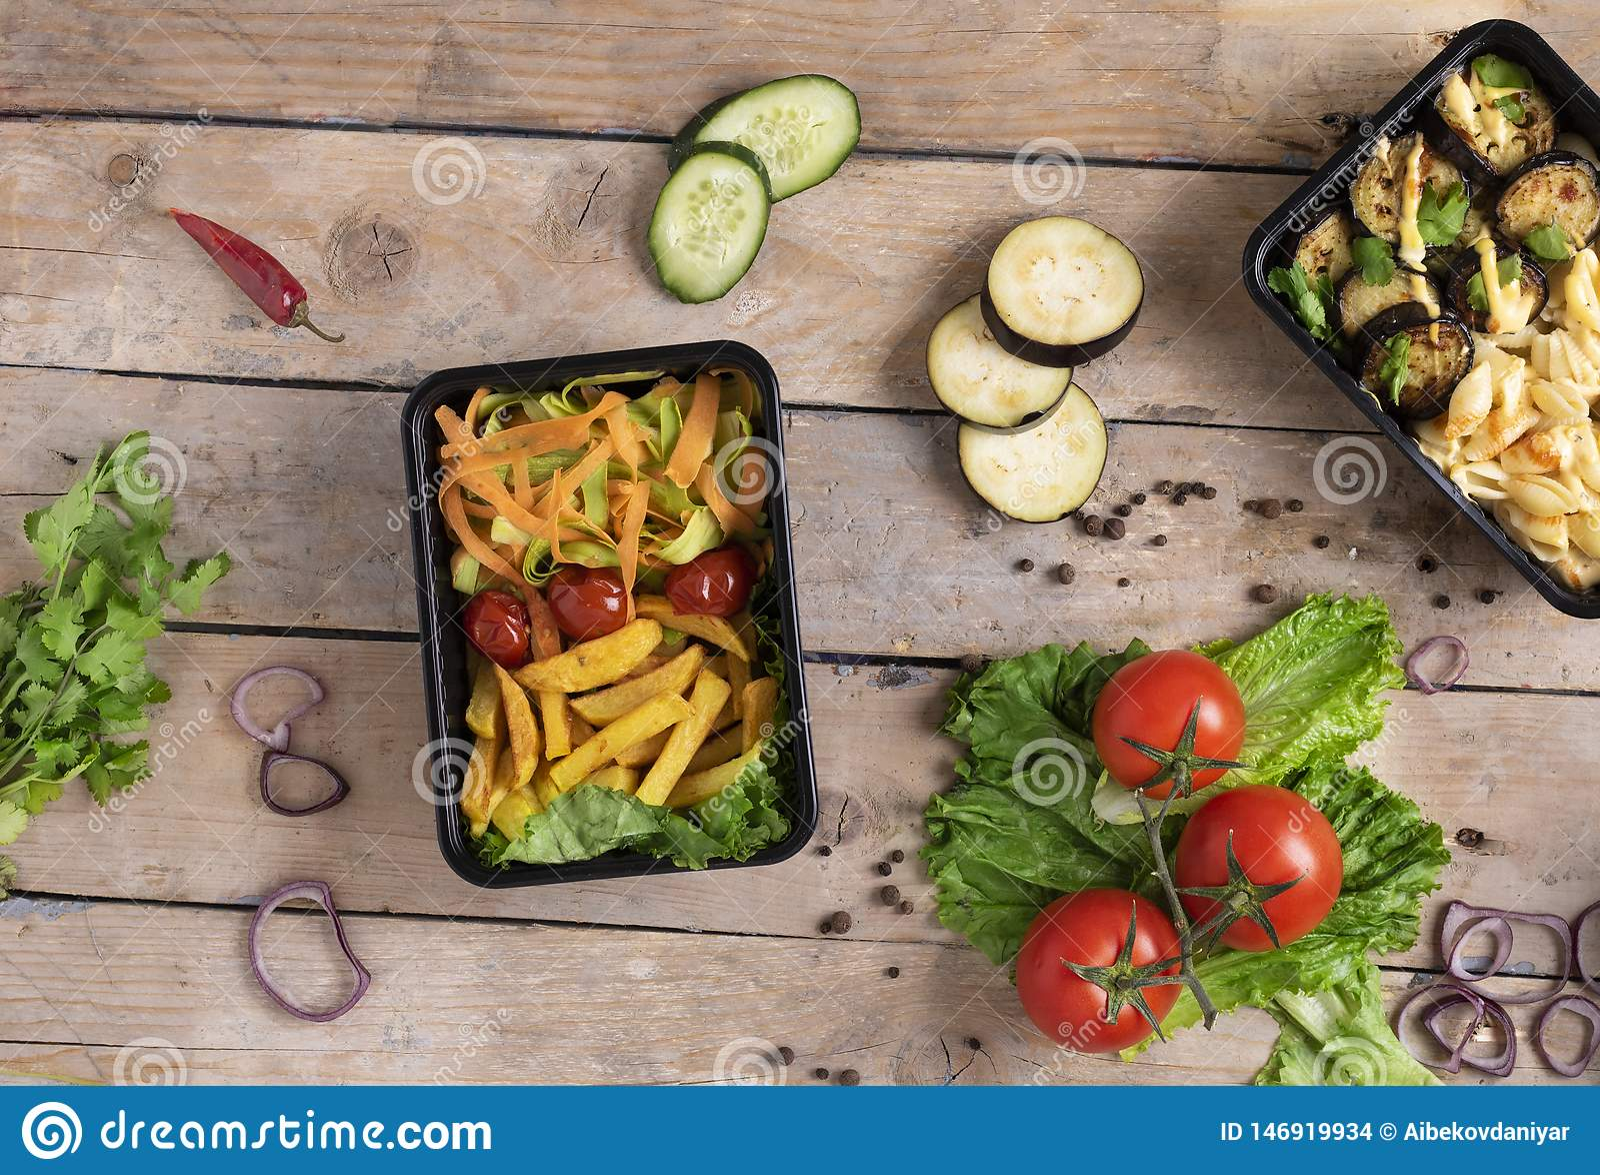 Twee plastic containers met geroosterde kippenvleugels en rauwe groenten op rustieke achtergrond, groentensalade en micro- greens